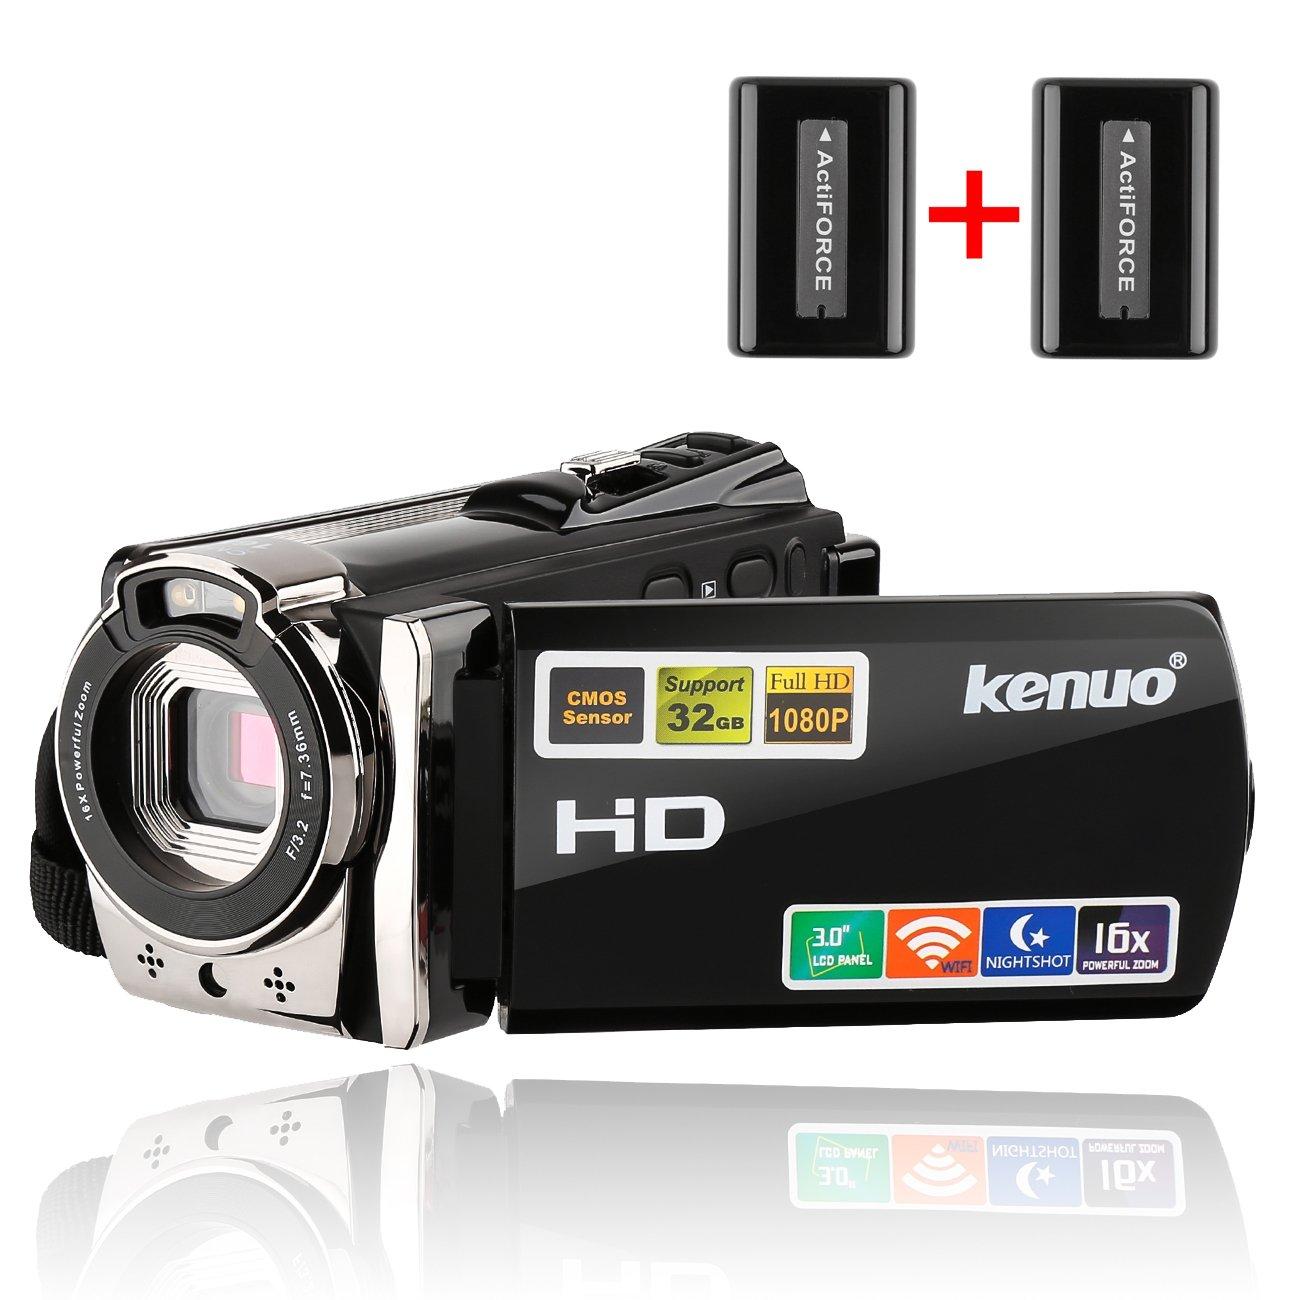 Camcorders,Kenuo 1080P 24MP HD WiFi Digital video Camera, 3.0''TFT LCD IR Night Vision 16X Digital Zoom Stabilization 270 Degree Rotation Screen Camera Bag Lithium Battery